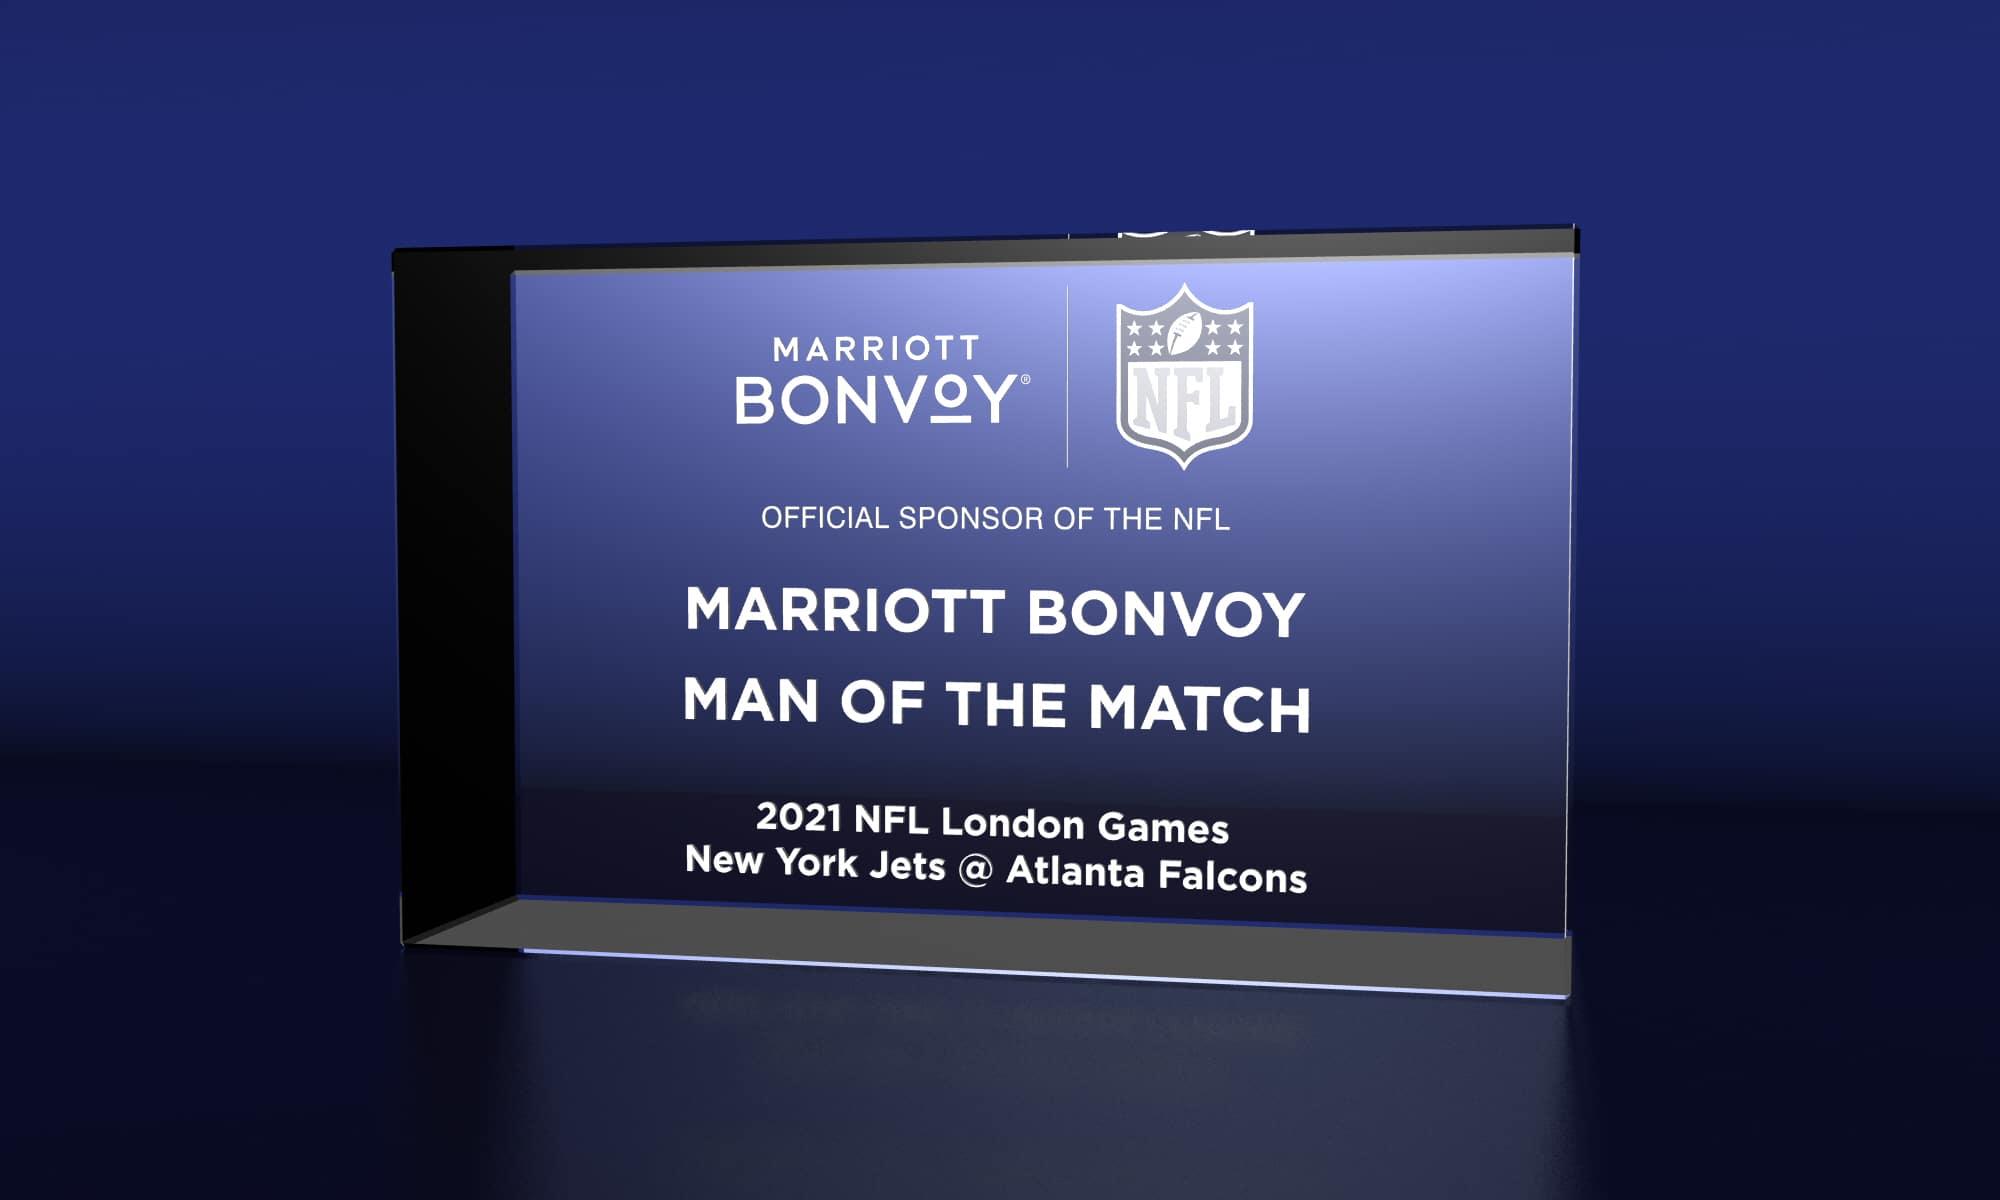 Marriott Bonvoy Man of the Match